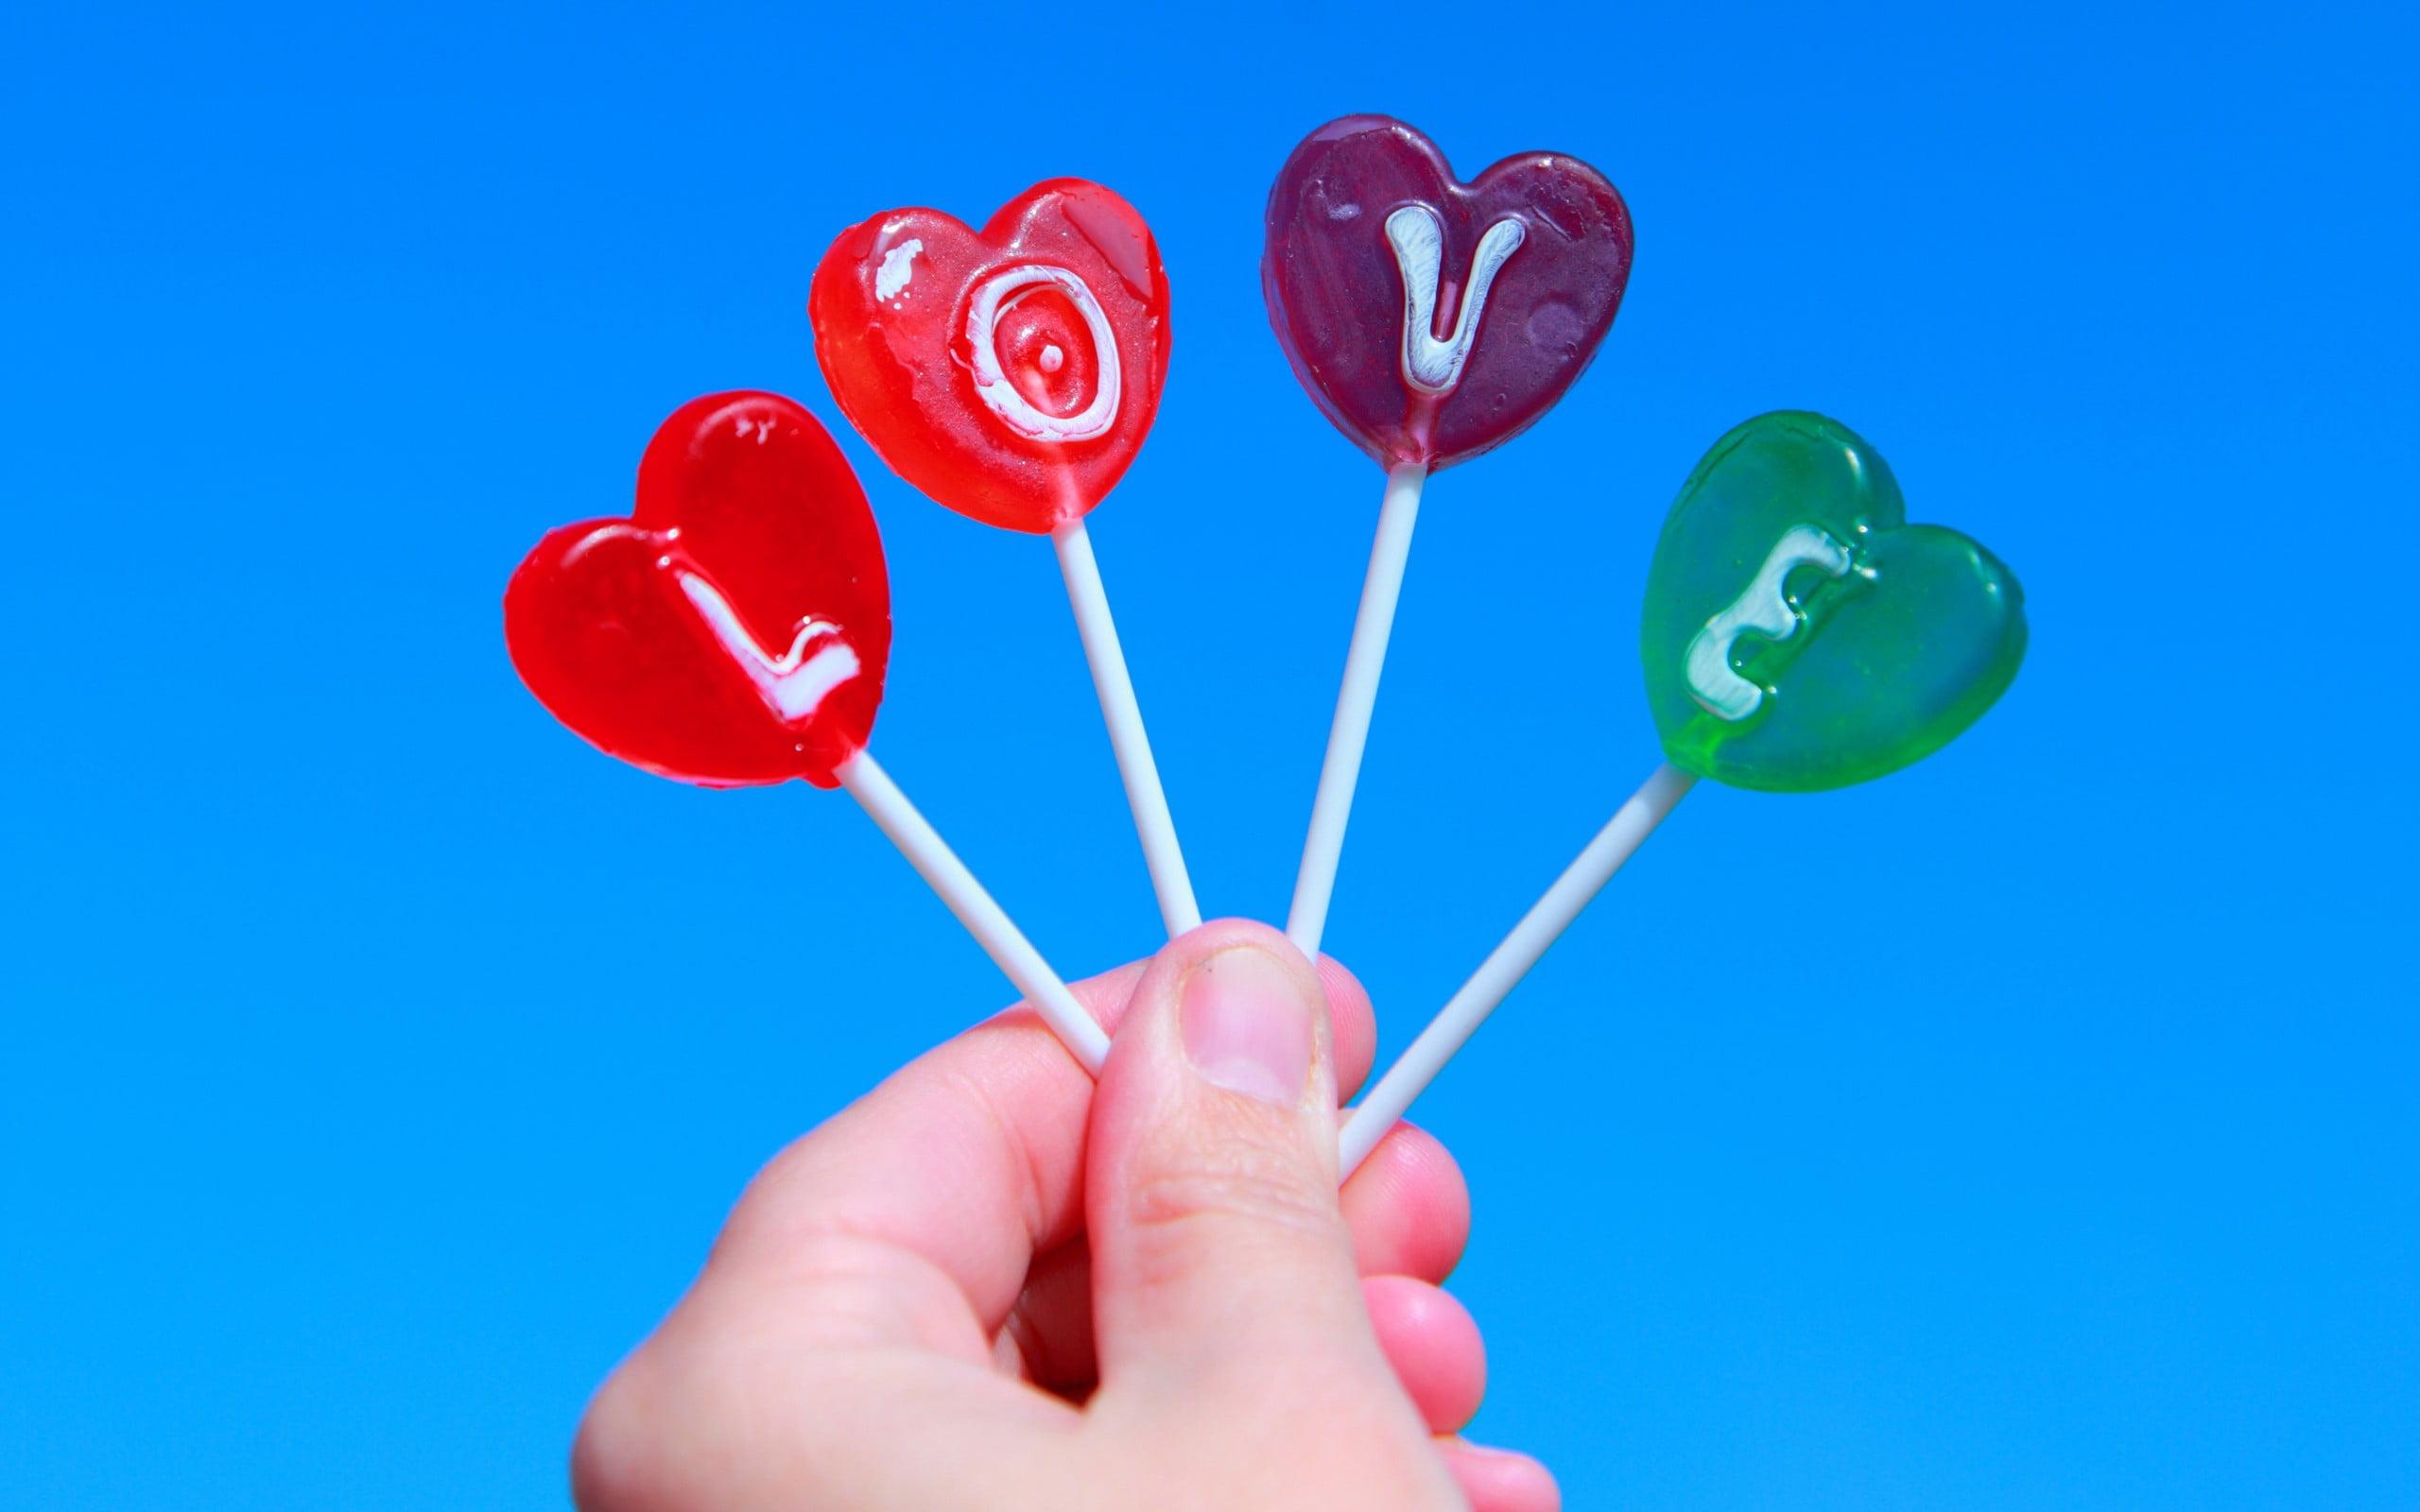 Four assorted color lollipops love candies HD wallpaper 2560x1600